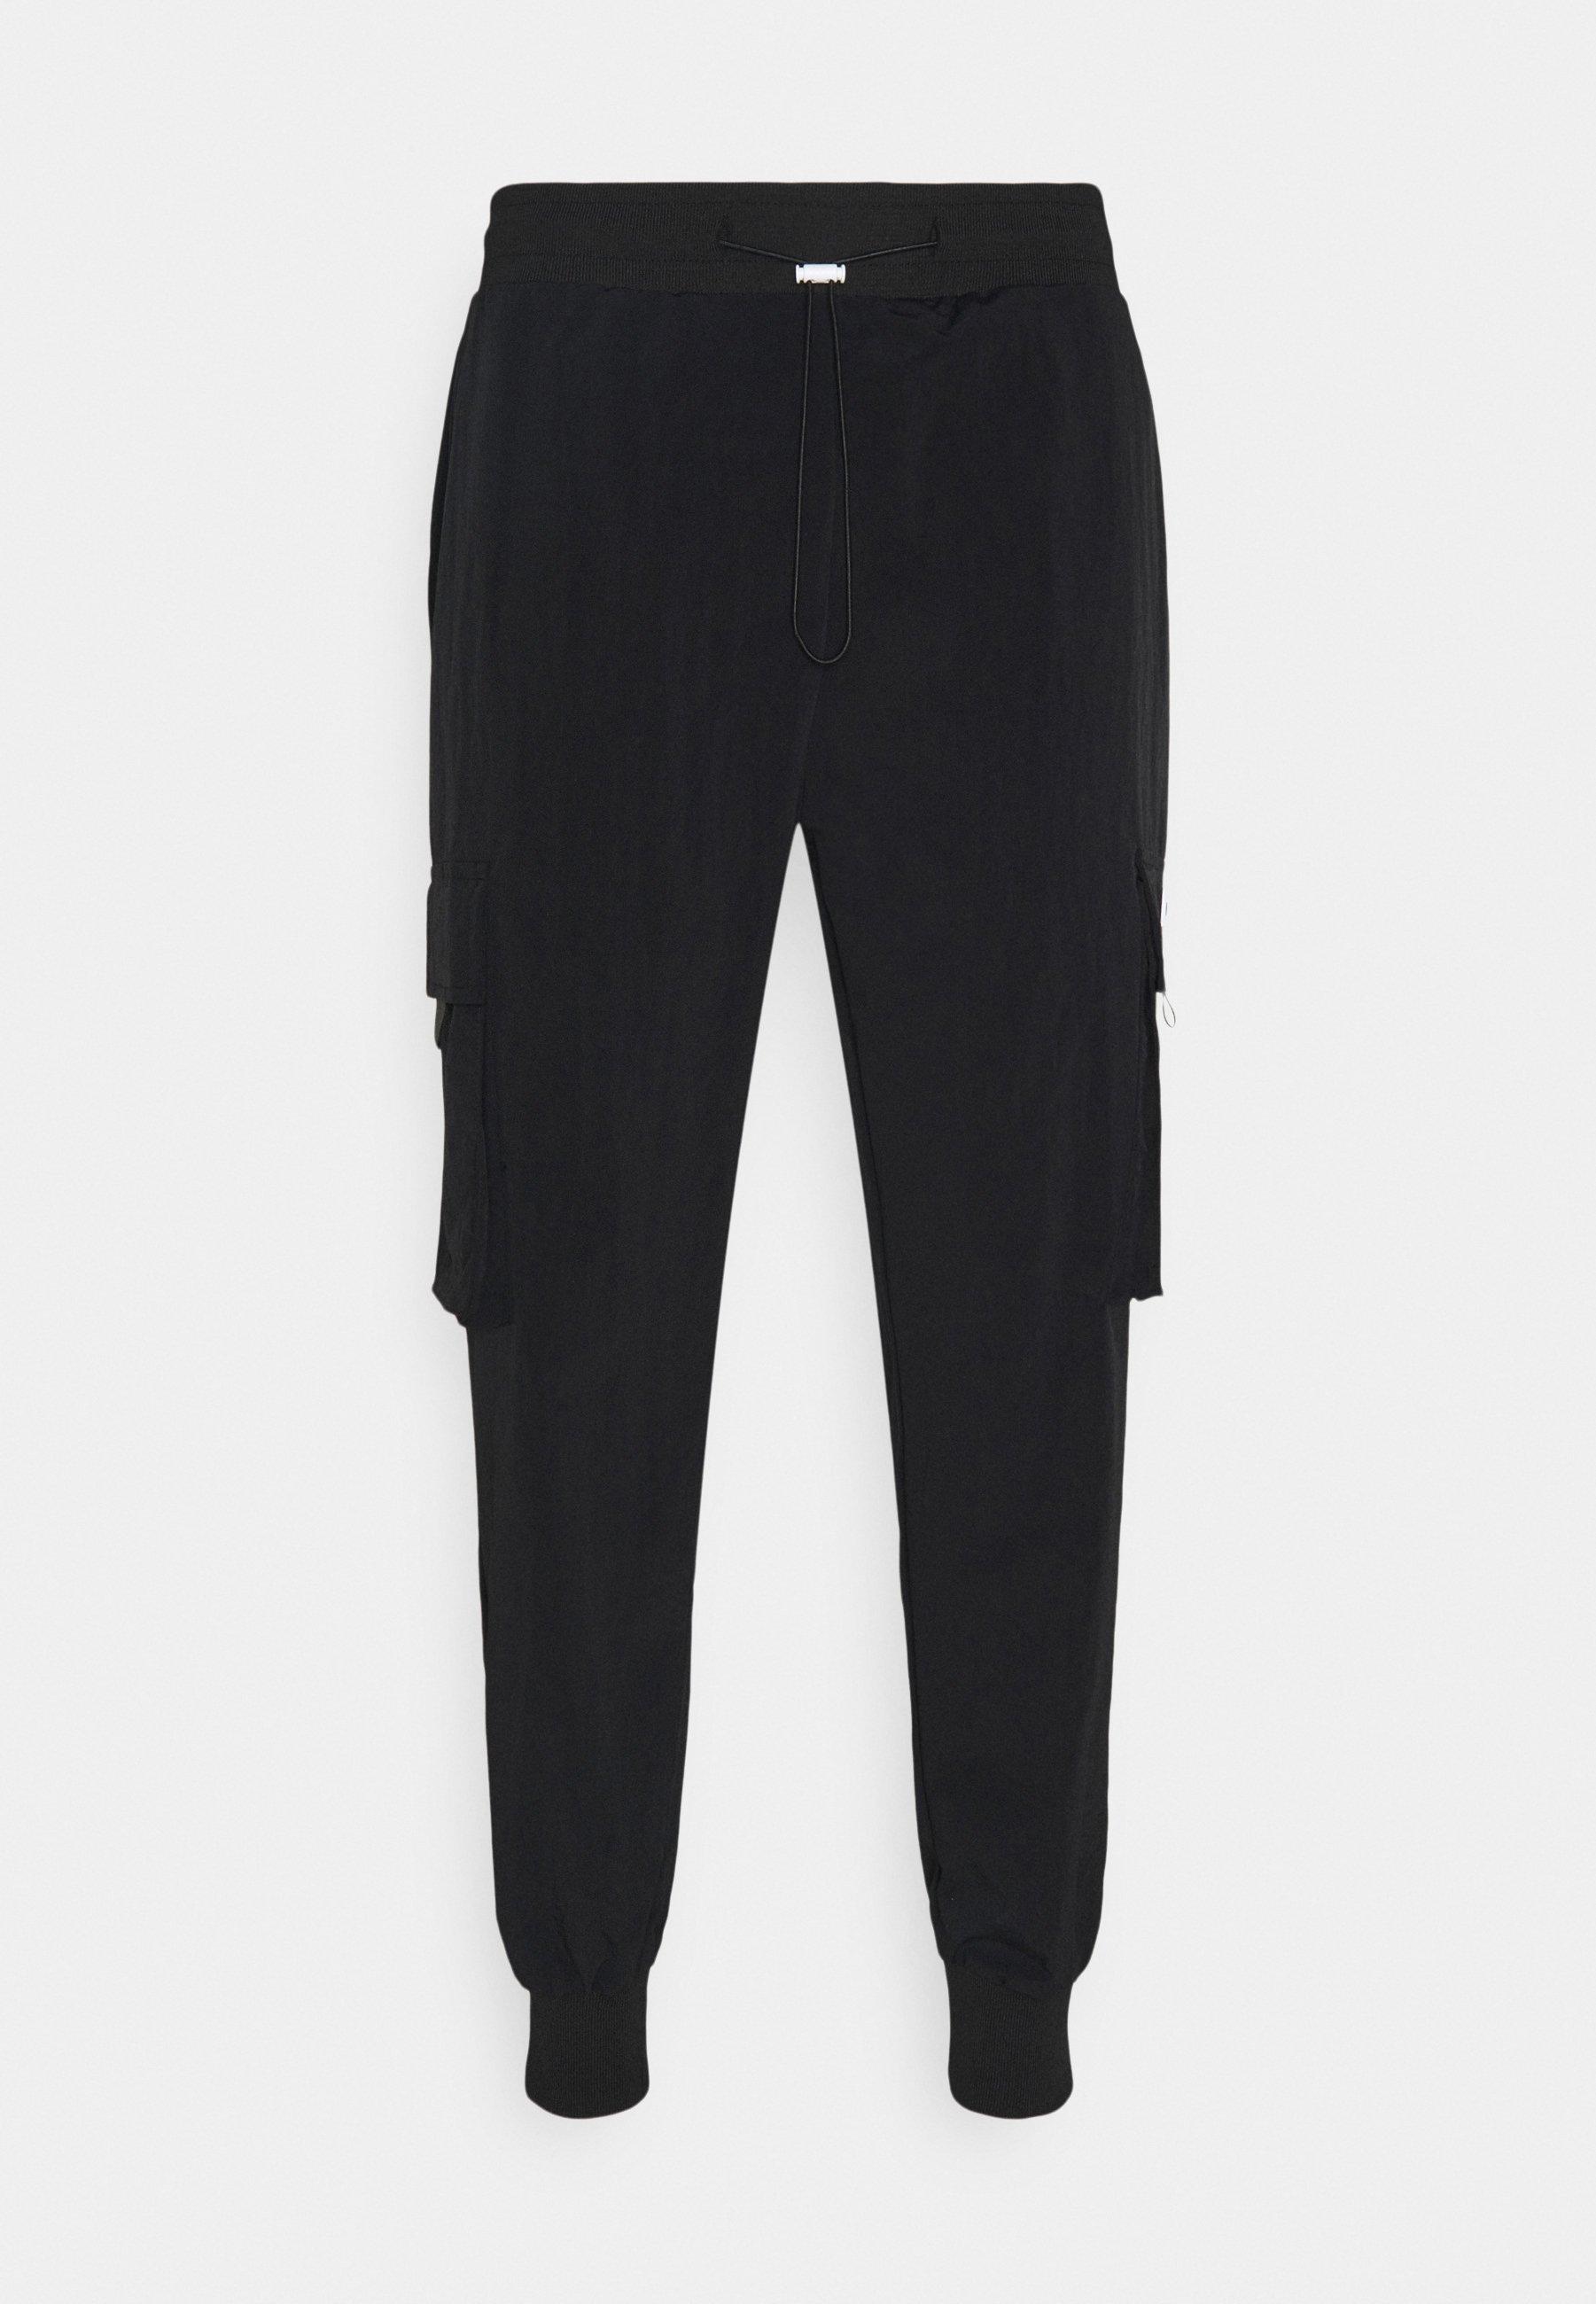 Femme RENO PANTS UNISEX - Pantalon cargo